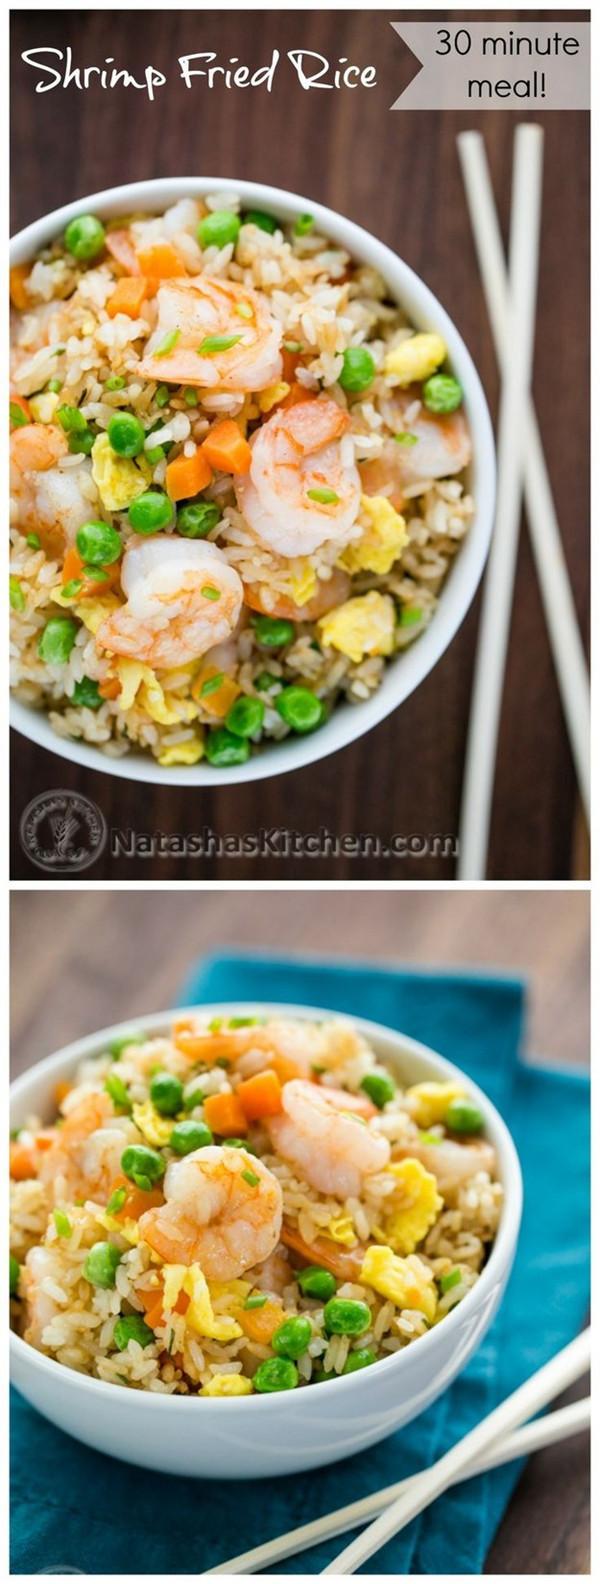 Healthy Shrimp Fried Rice  23 Easy Healthy Shrimp Recipes Pretty Designs us58